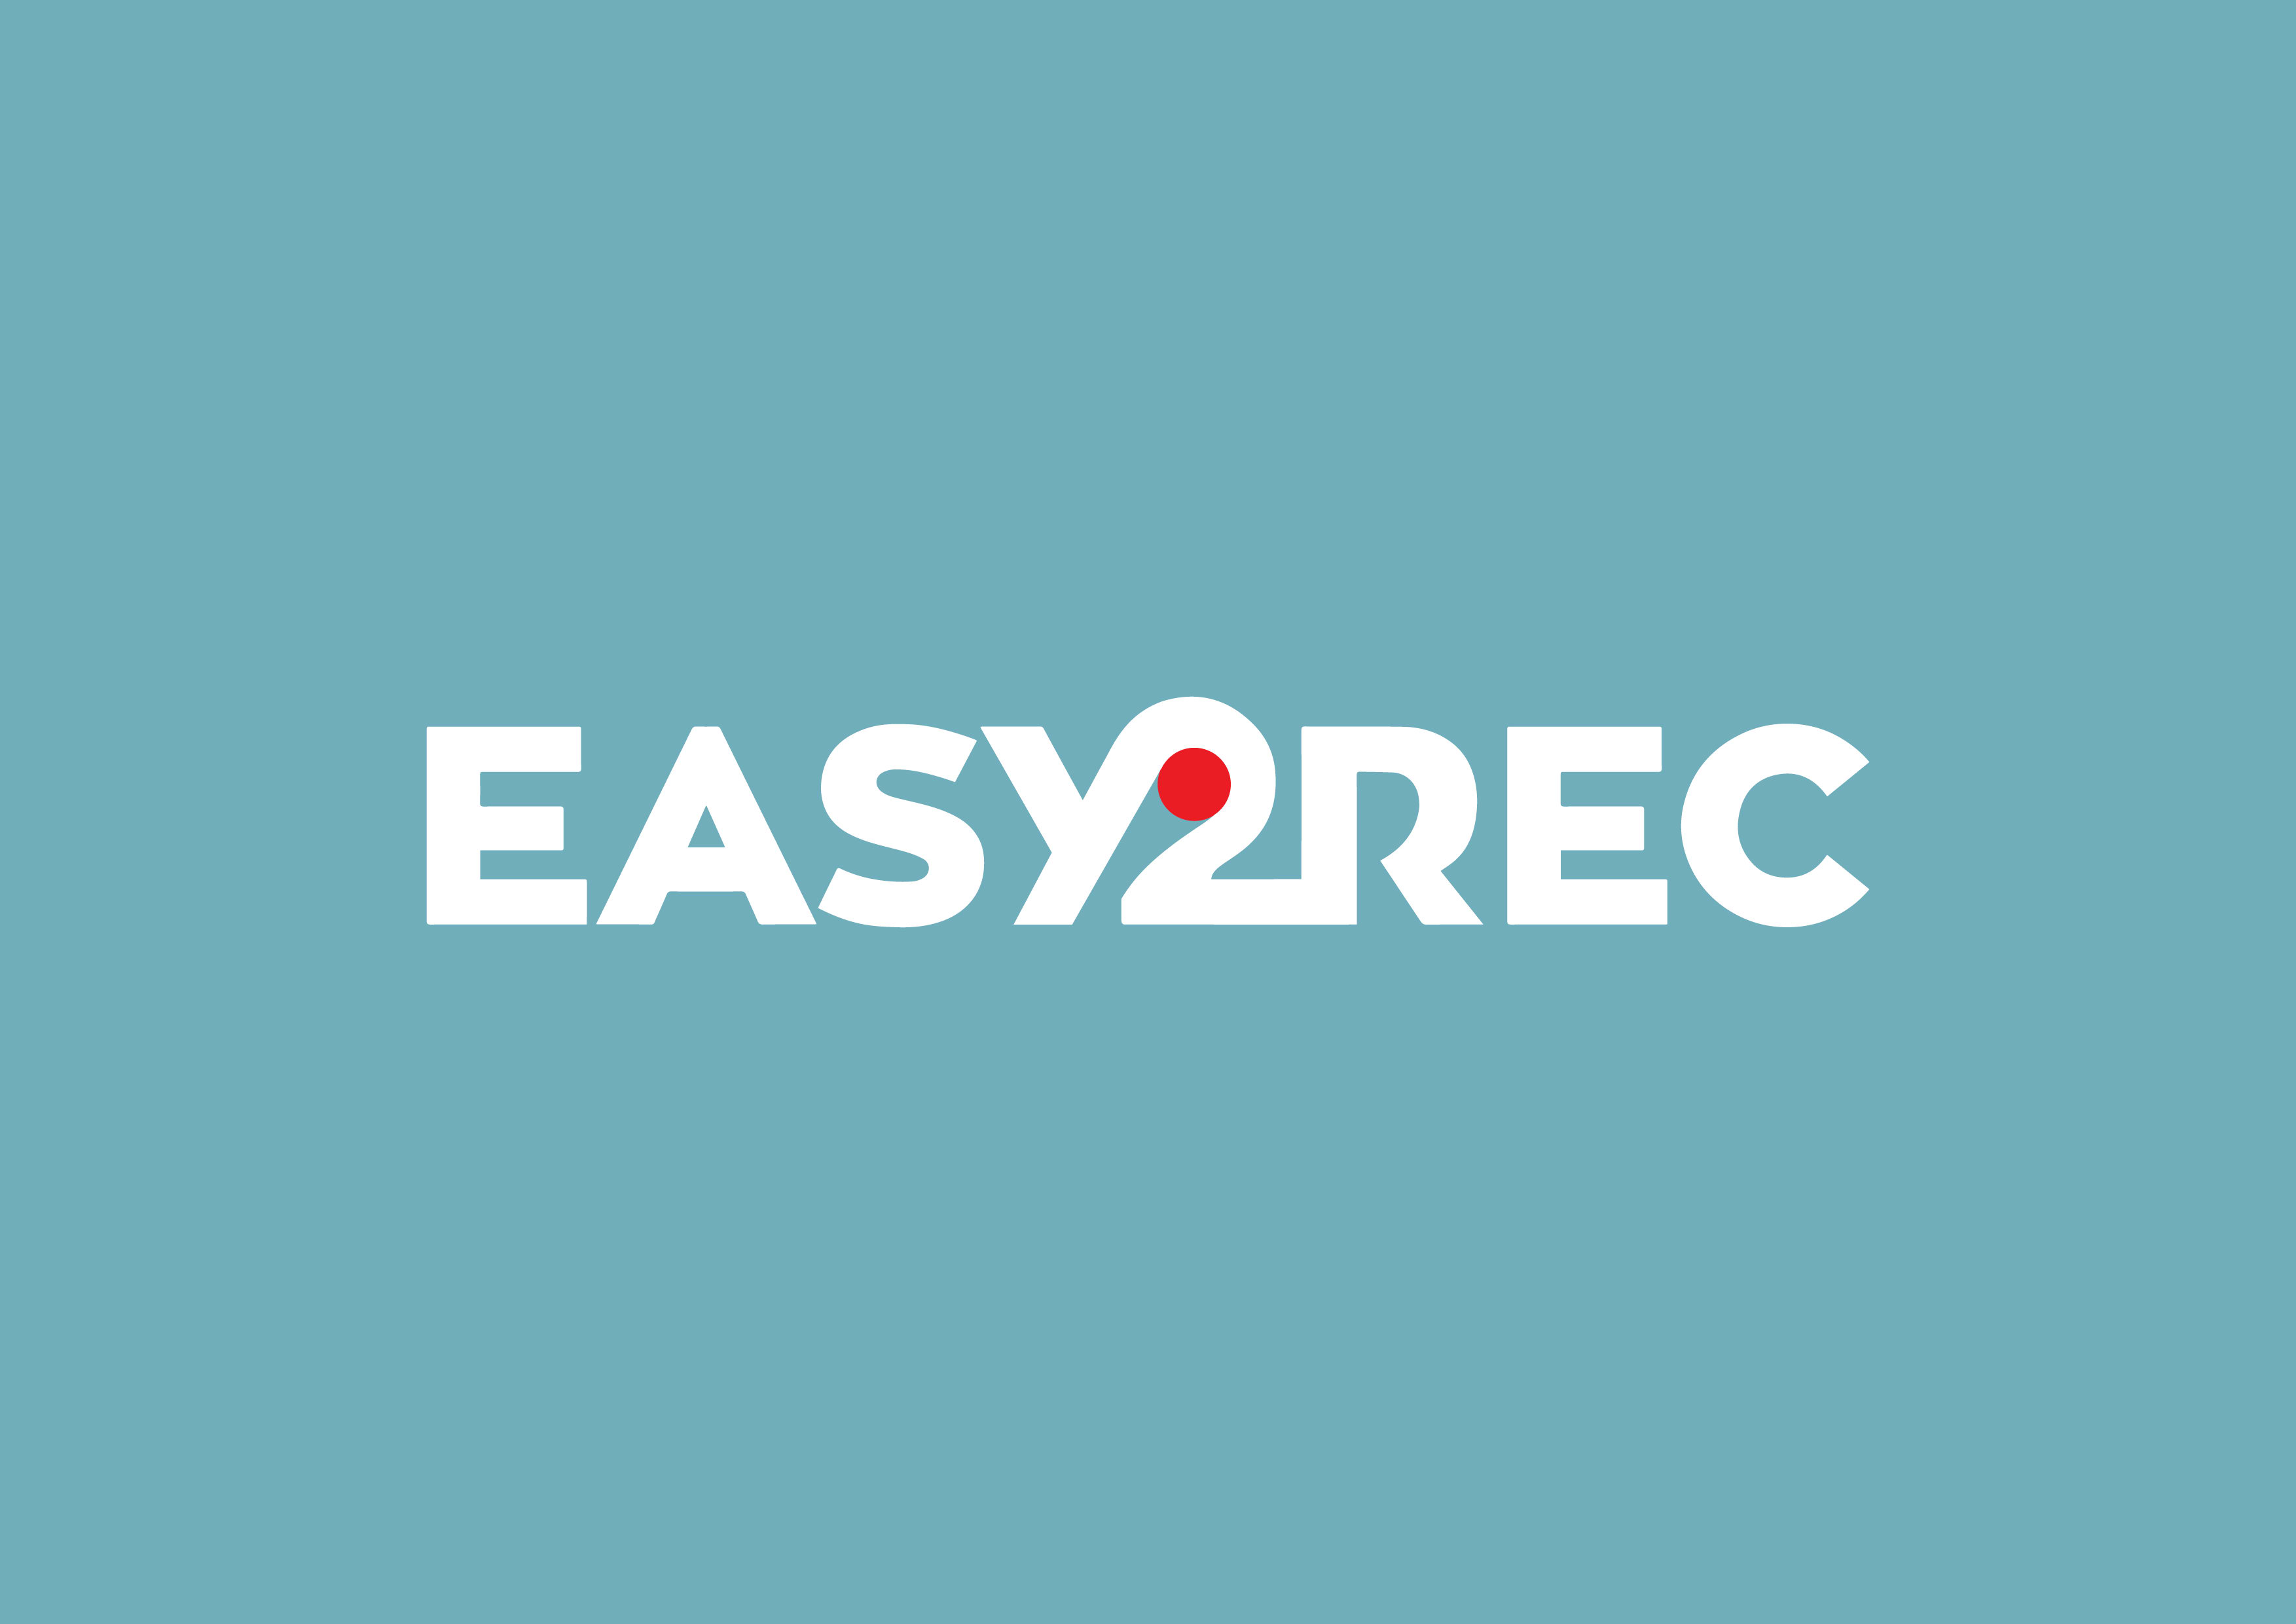 EASY2REC